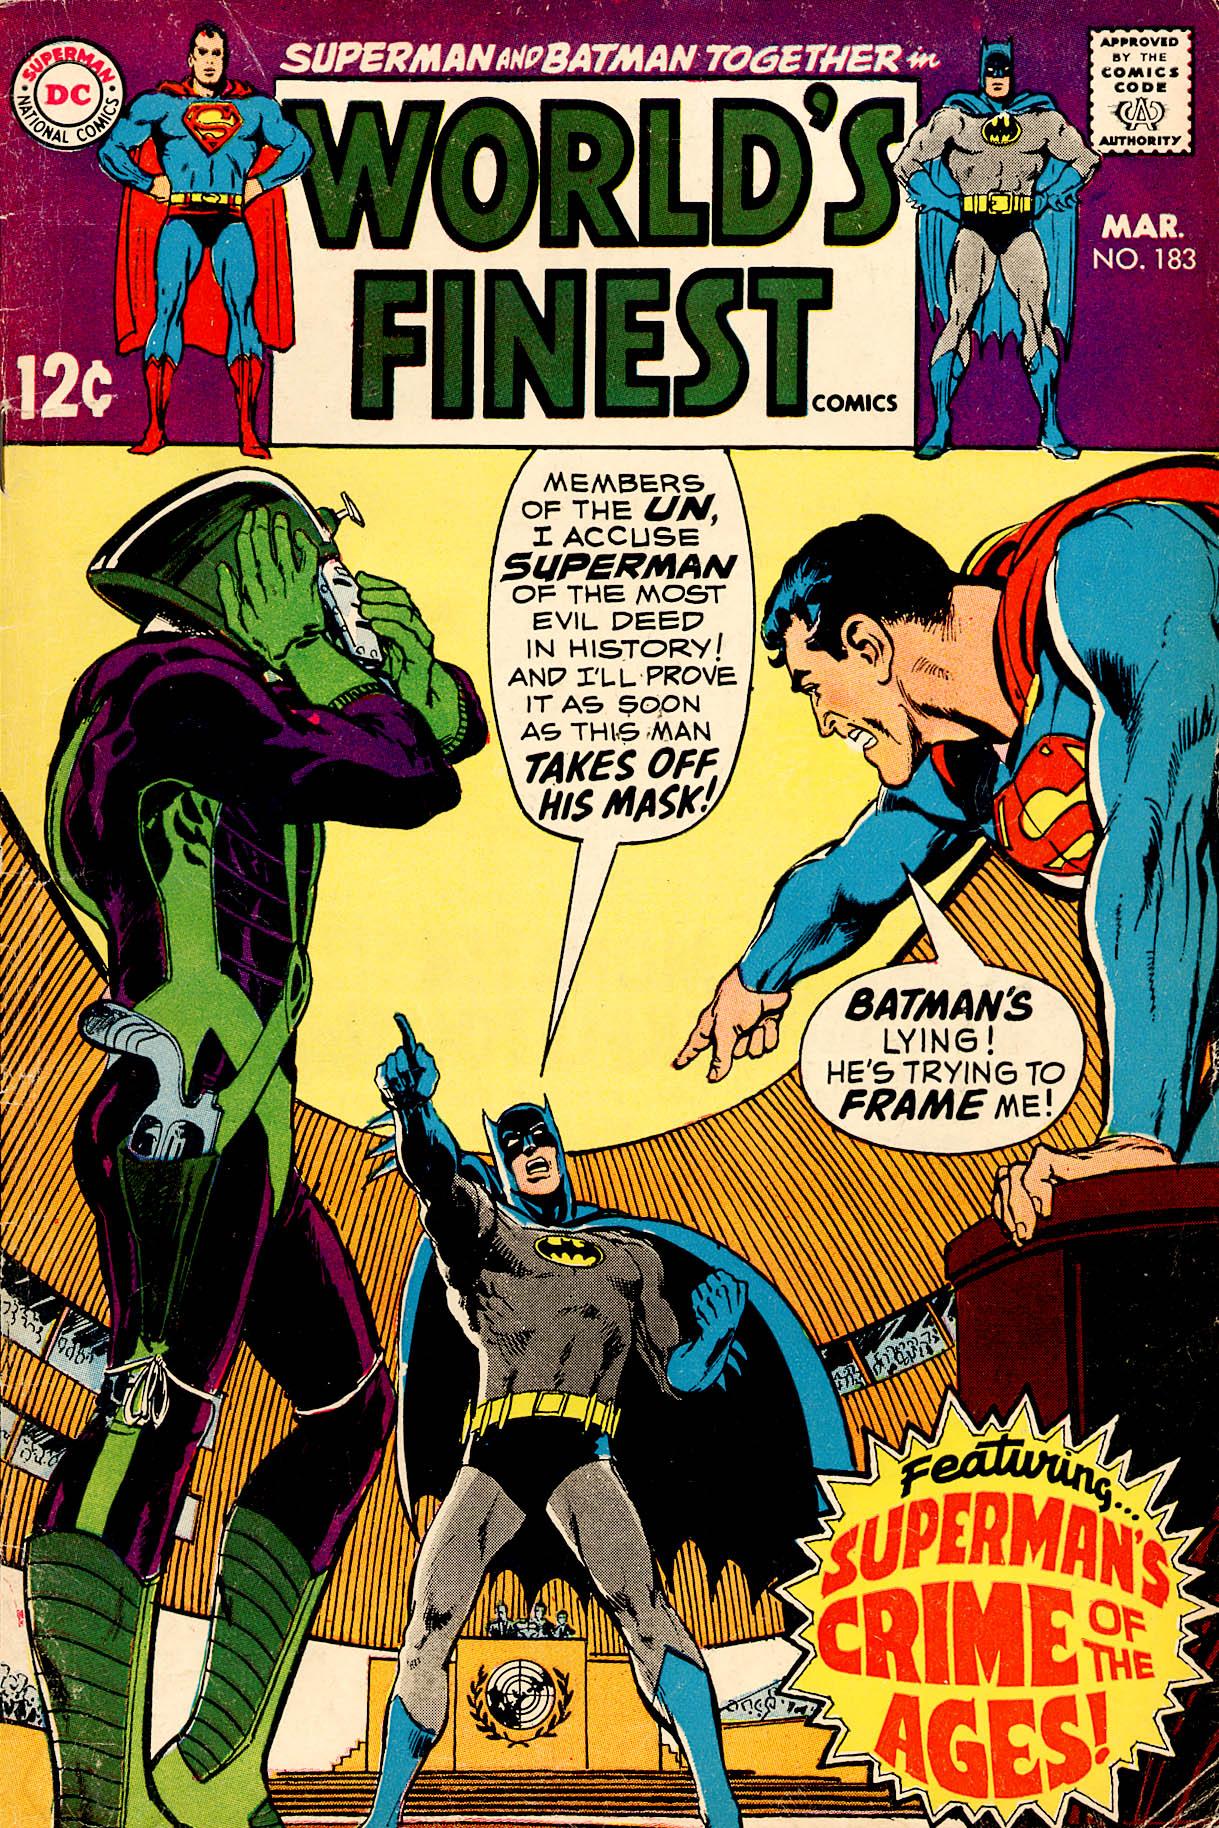 World's Finest Vol 1 183